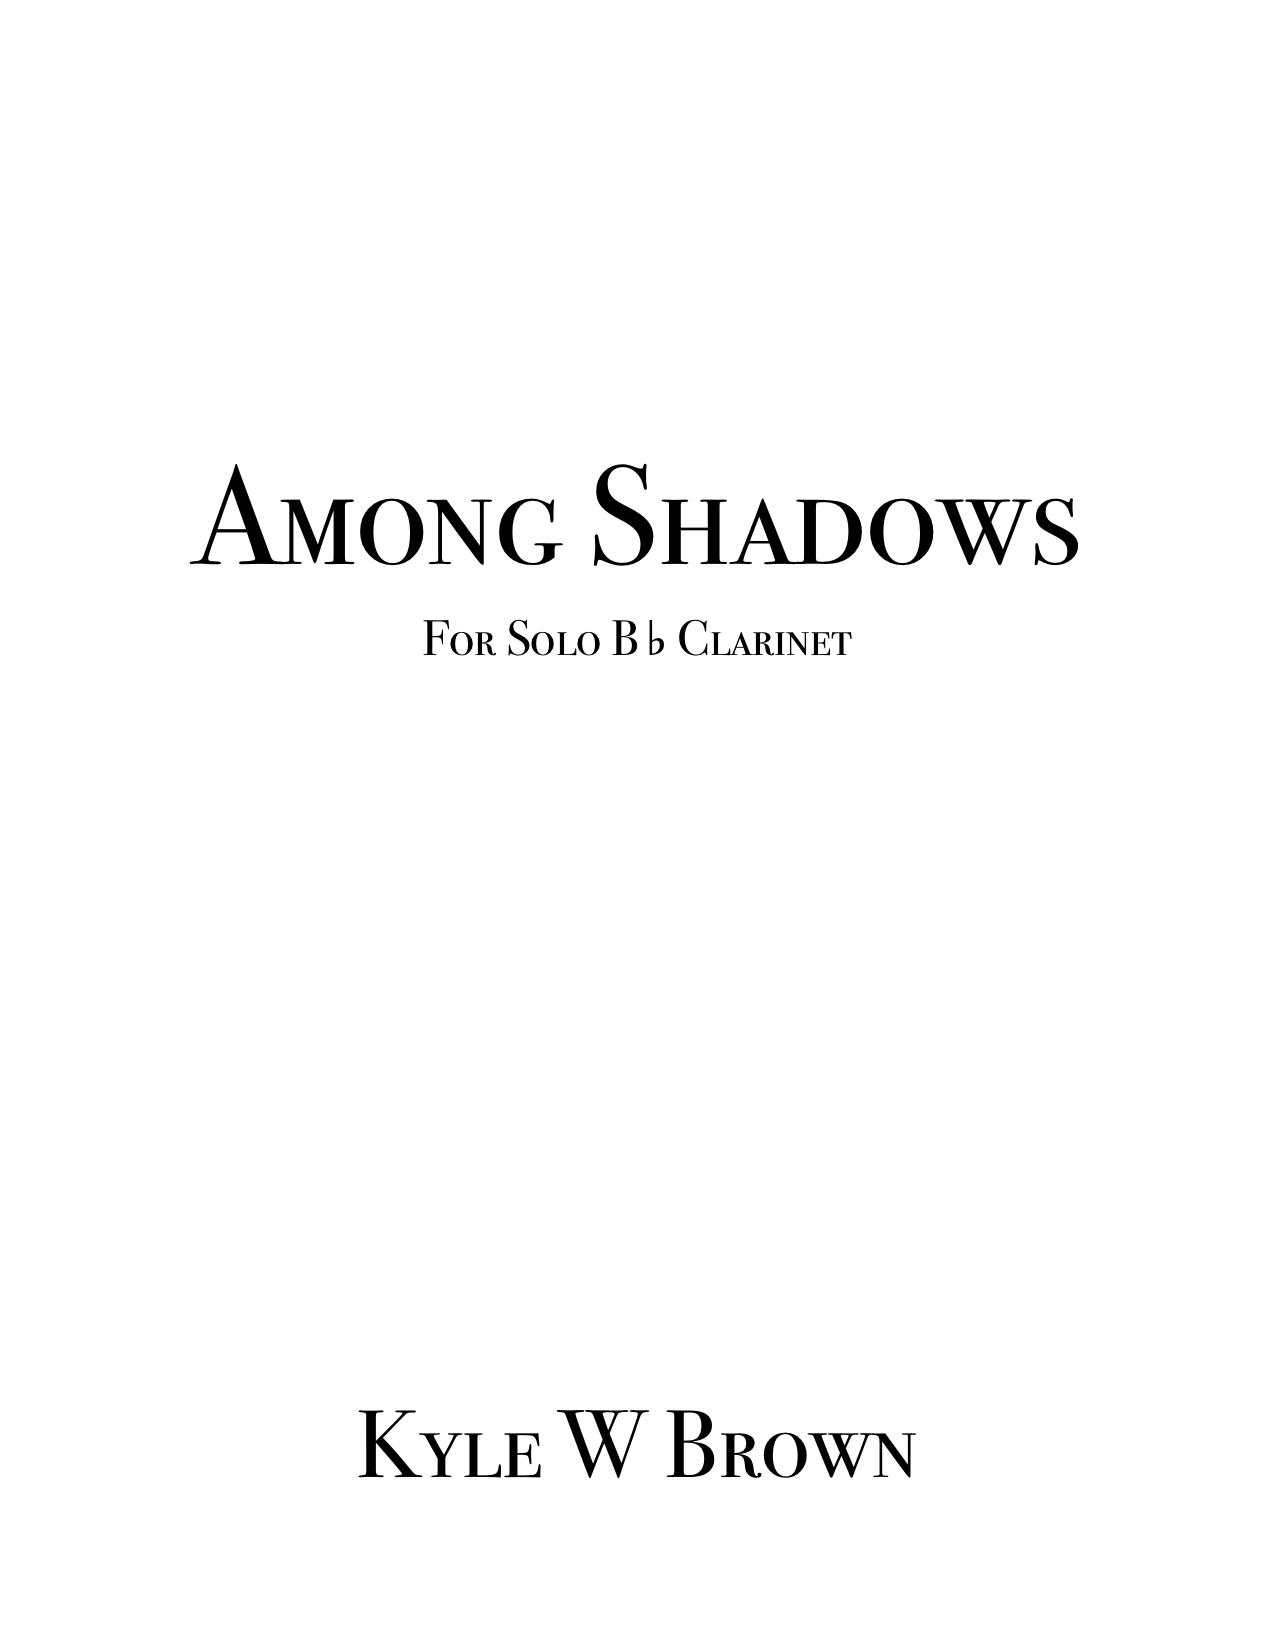 Microsoft Word - among shadows cover page.png